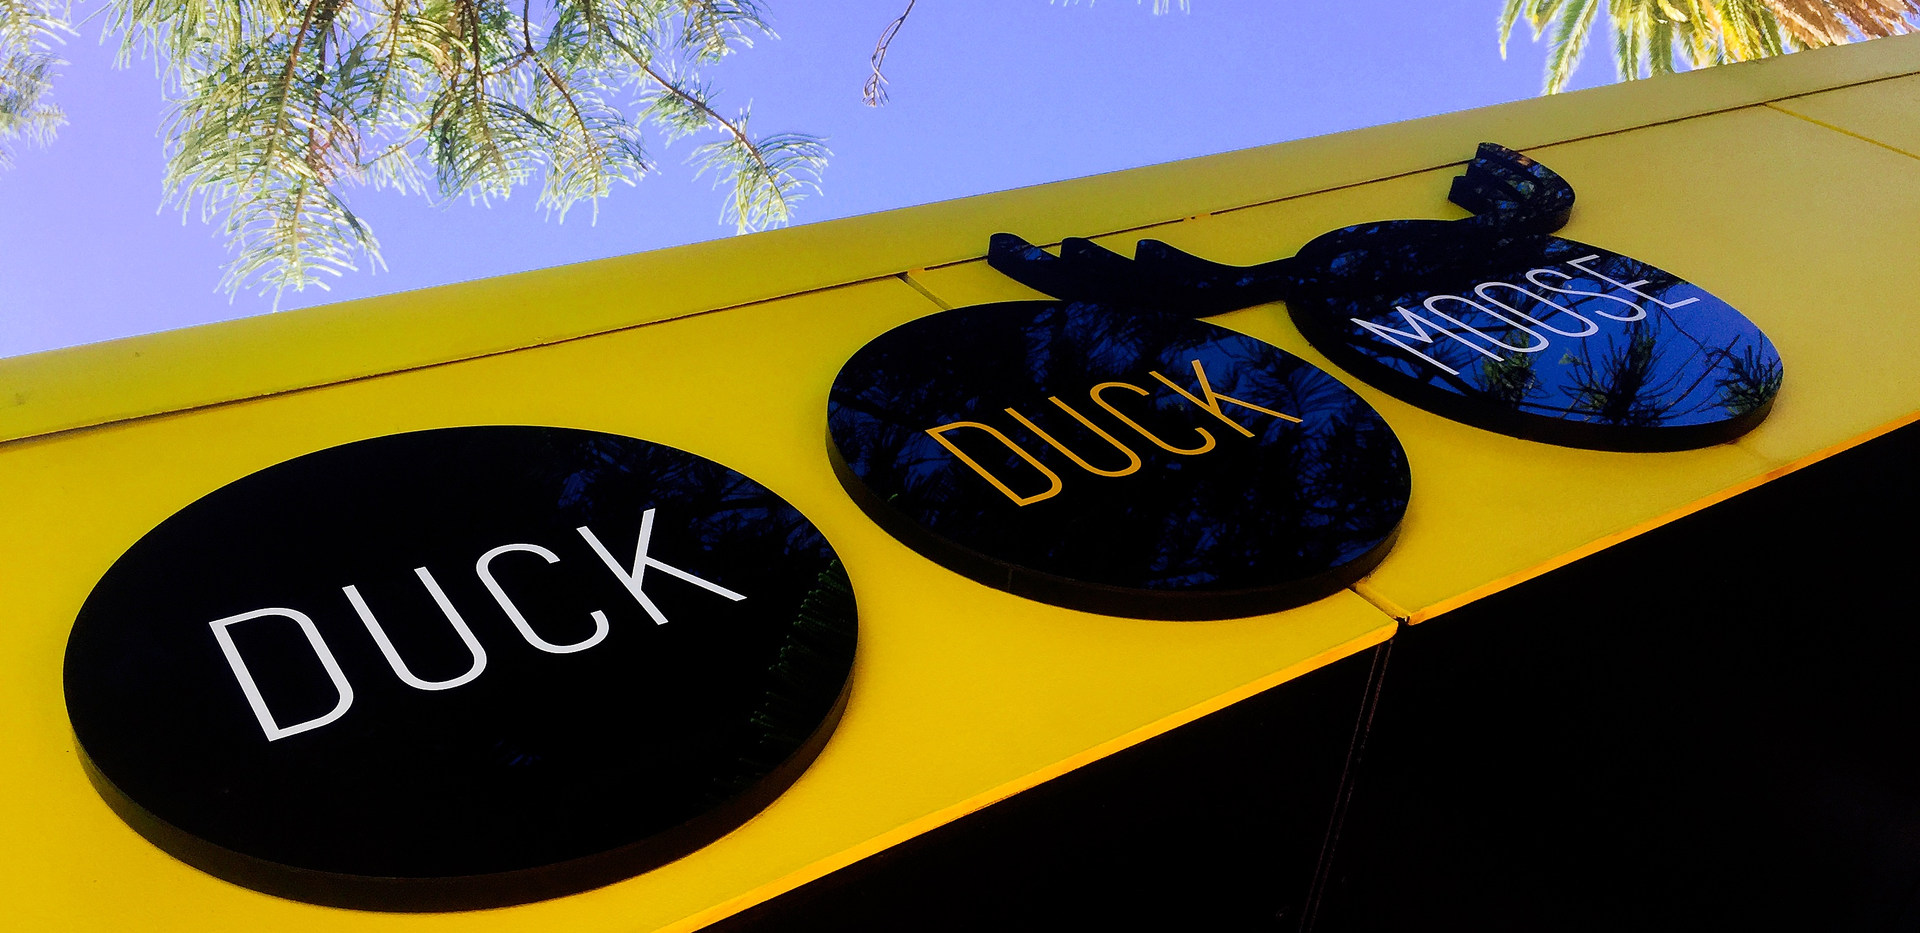 duck-duck-moose-9.jpeg